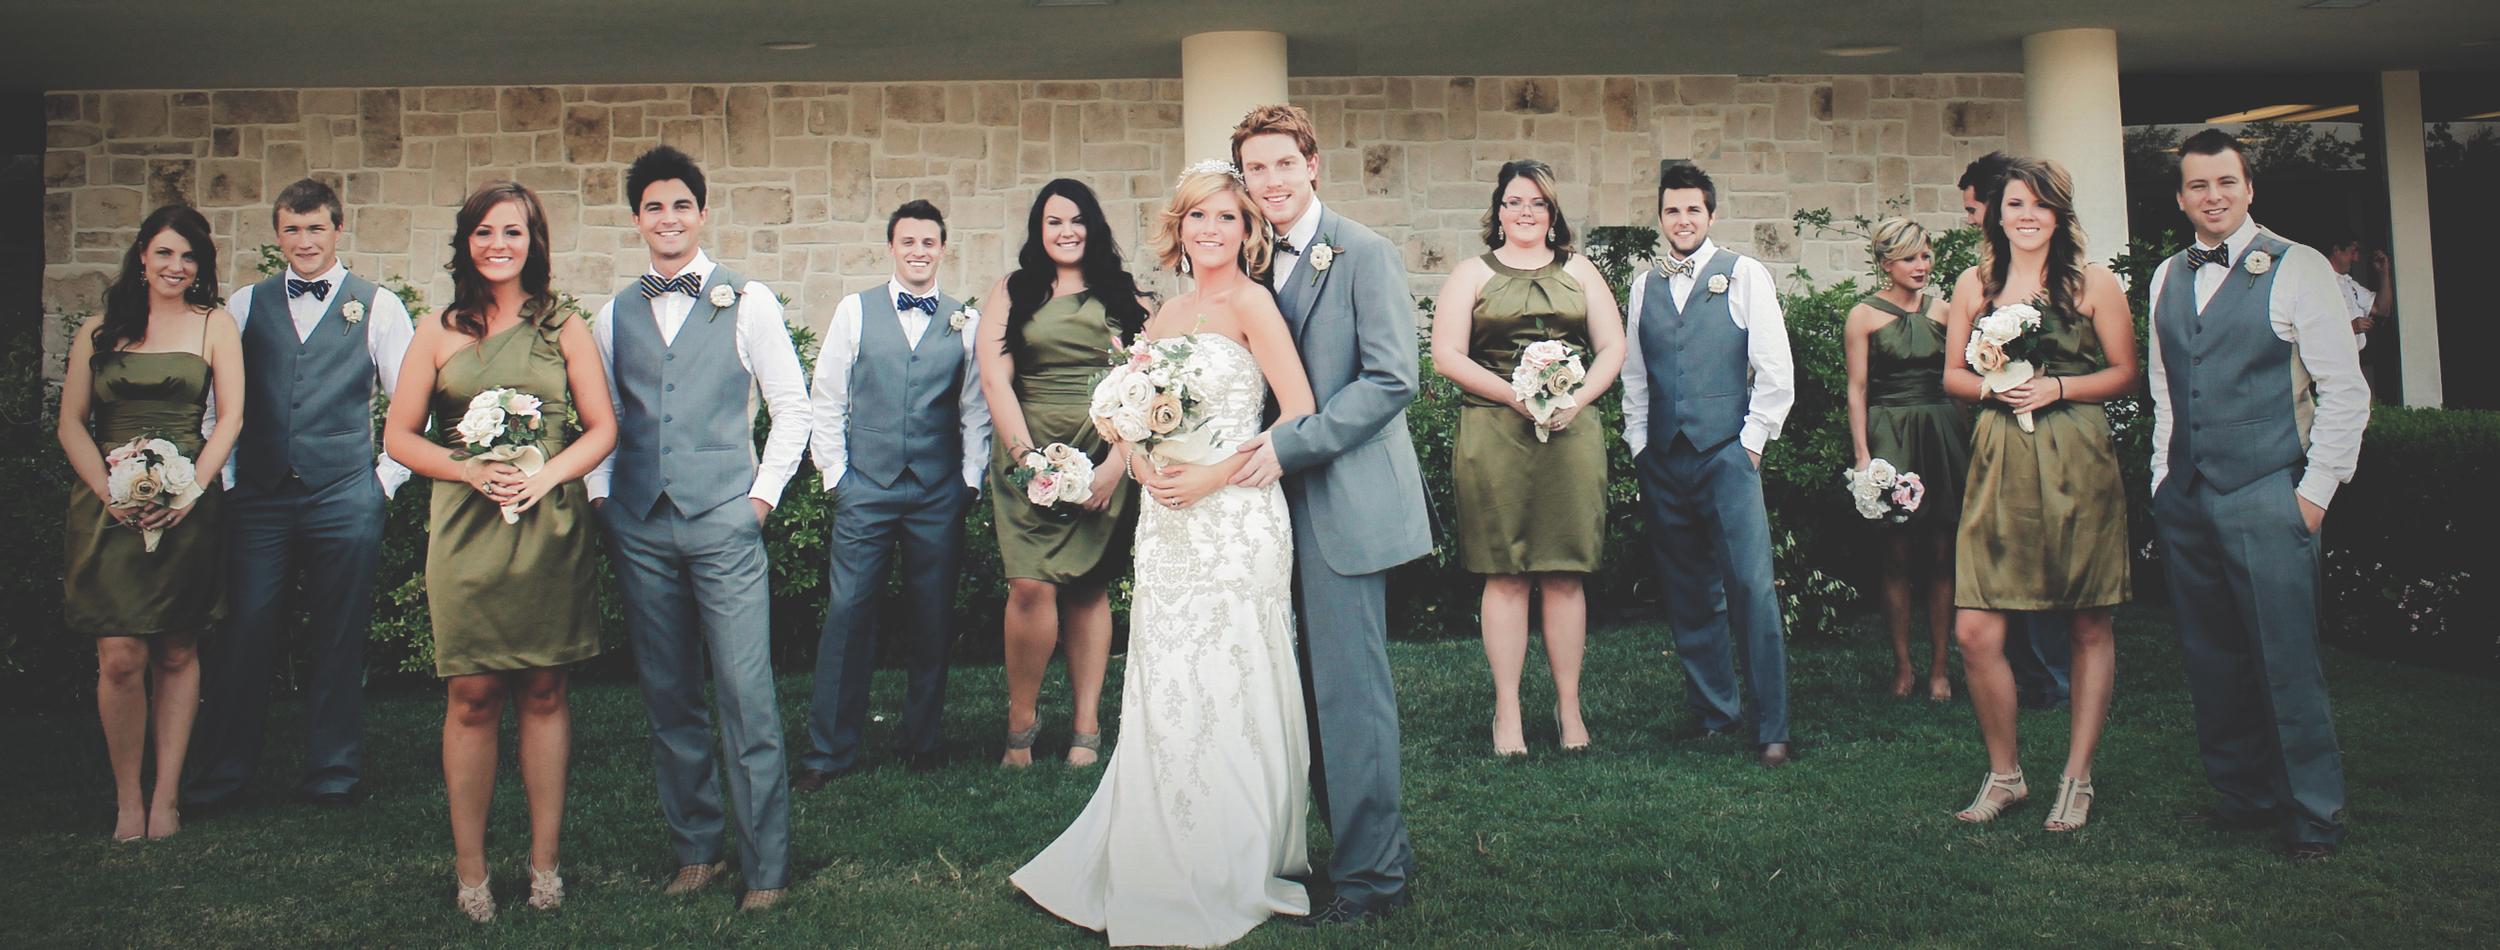 Daniel and Sam Mow Wedding Tulsa | The Picture People LA | Christi Childs (18 of 22).jpg